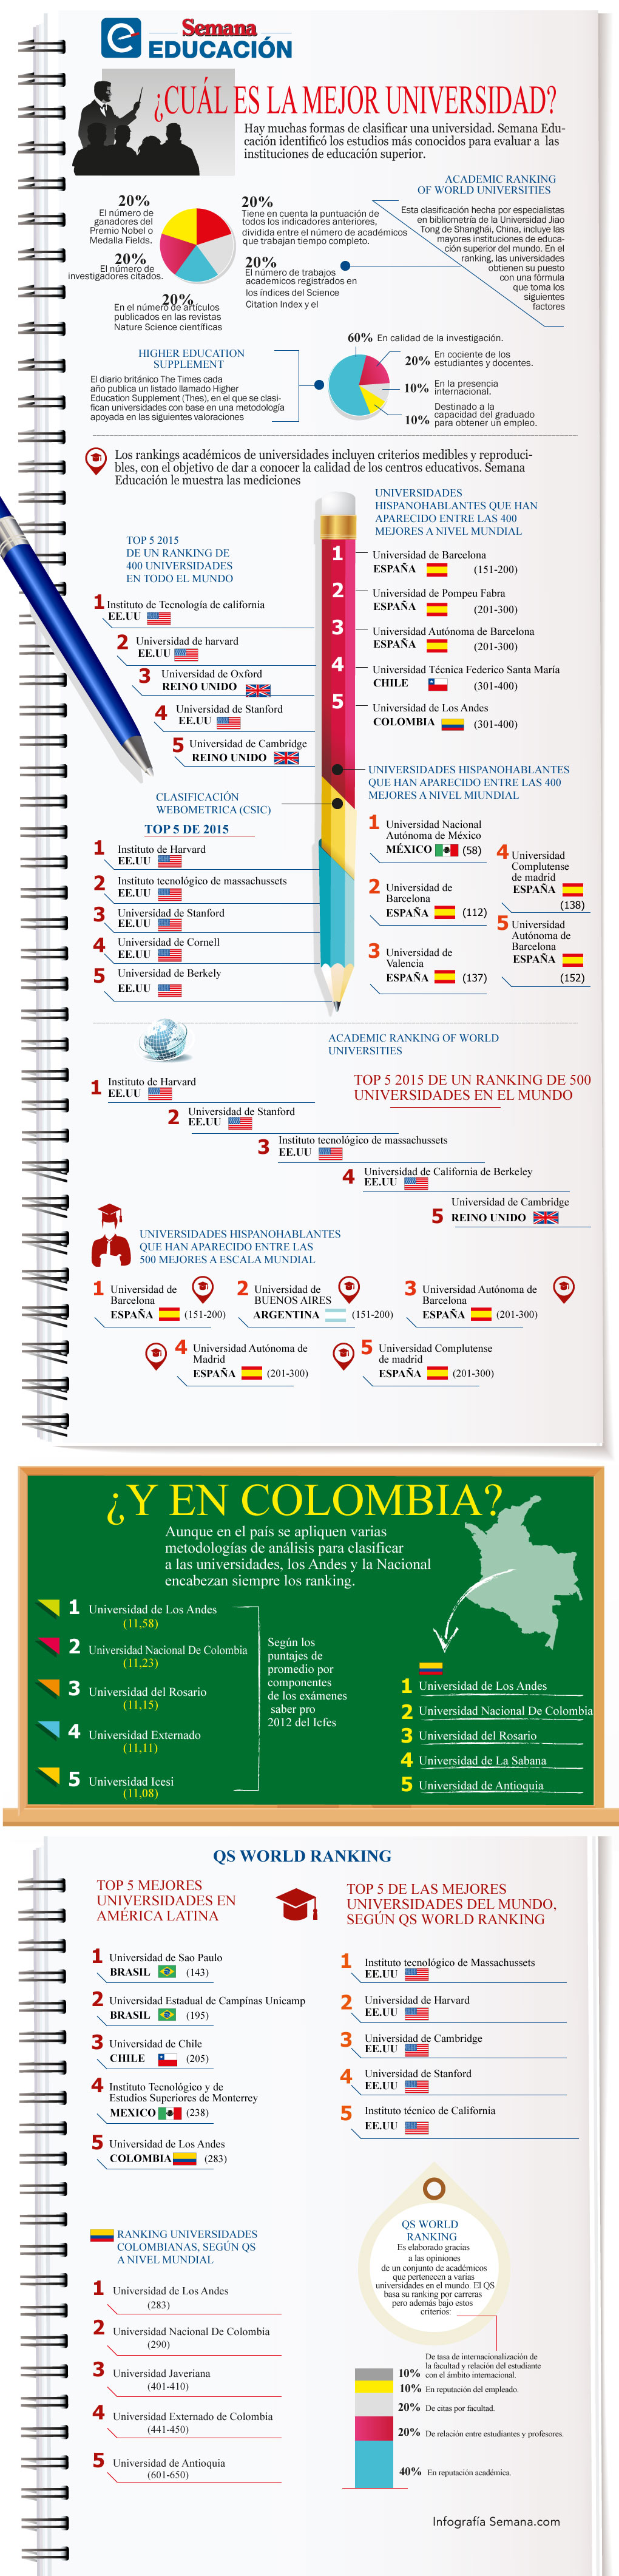 Las mejores Universidades del Mundo #infografia #infographic #education